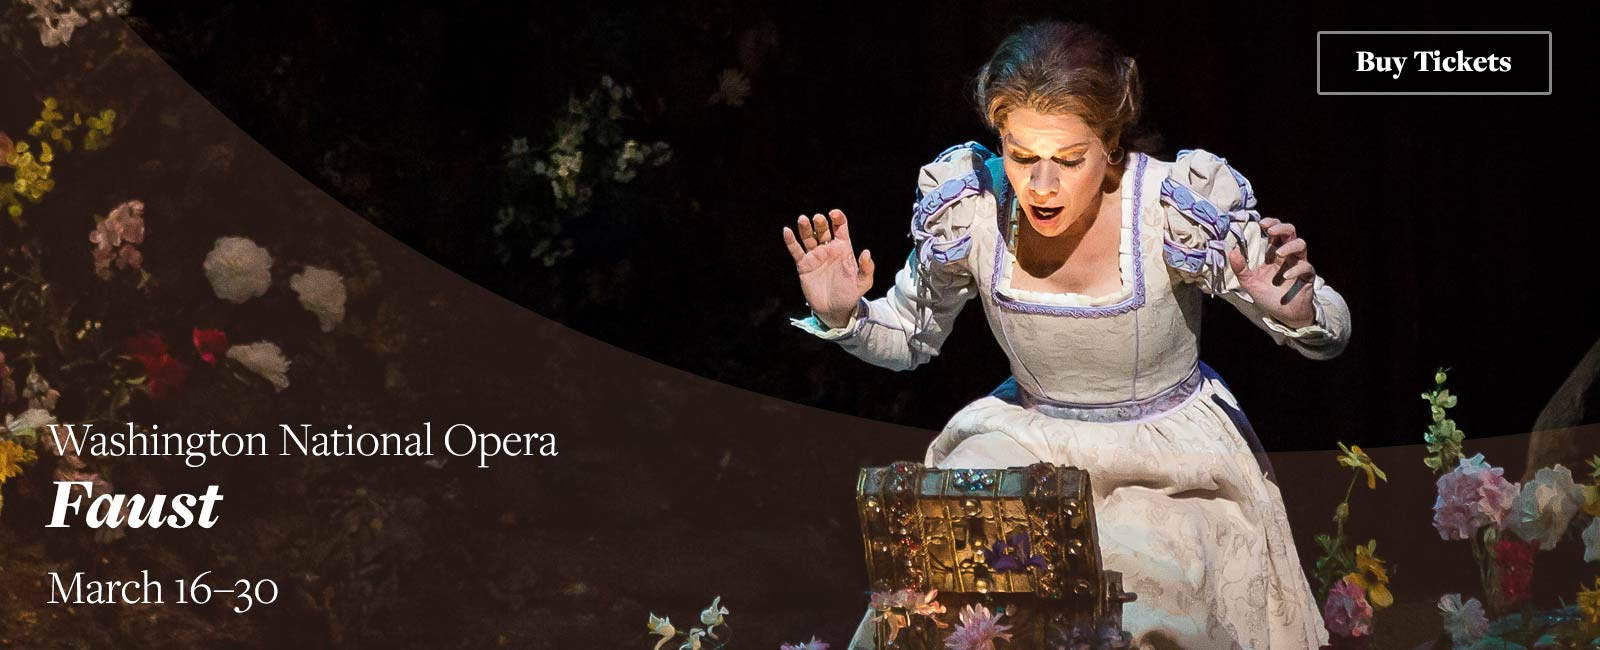 Washington National Opera: Faust